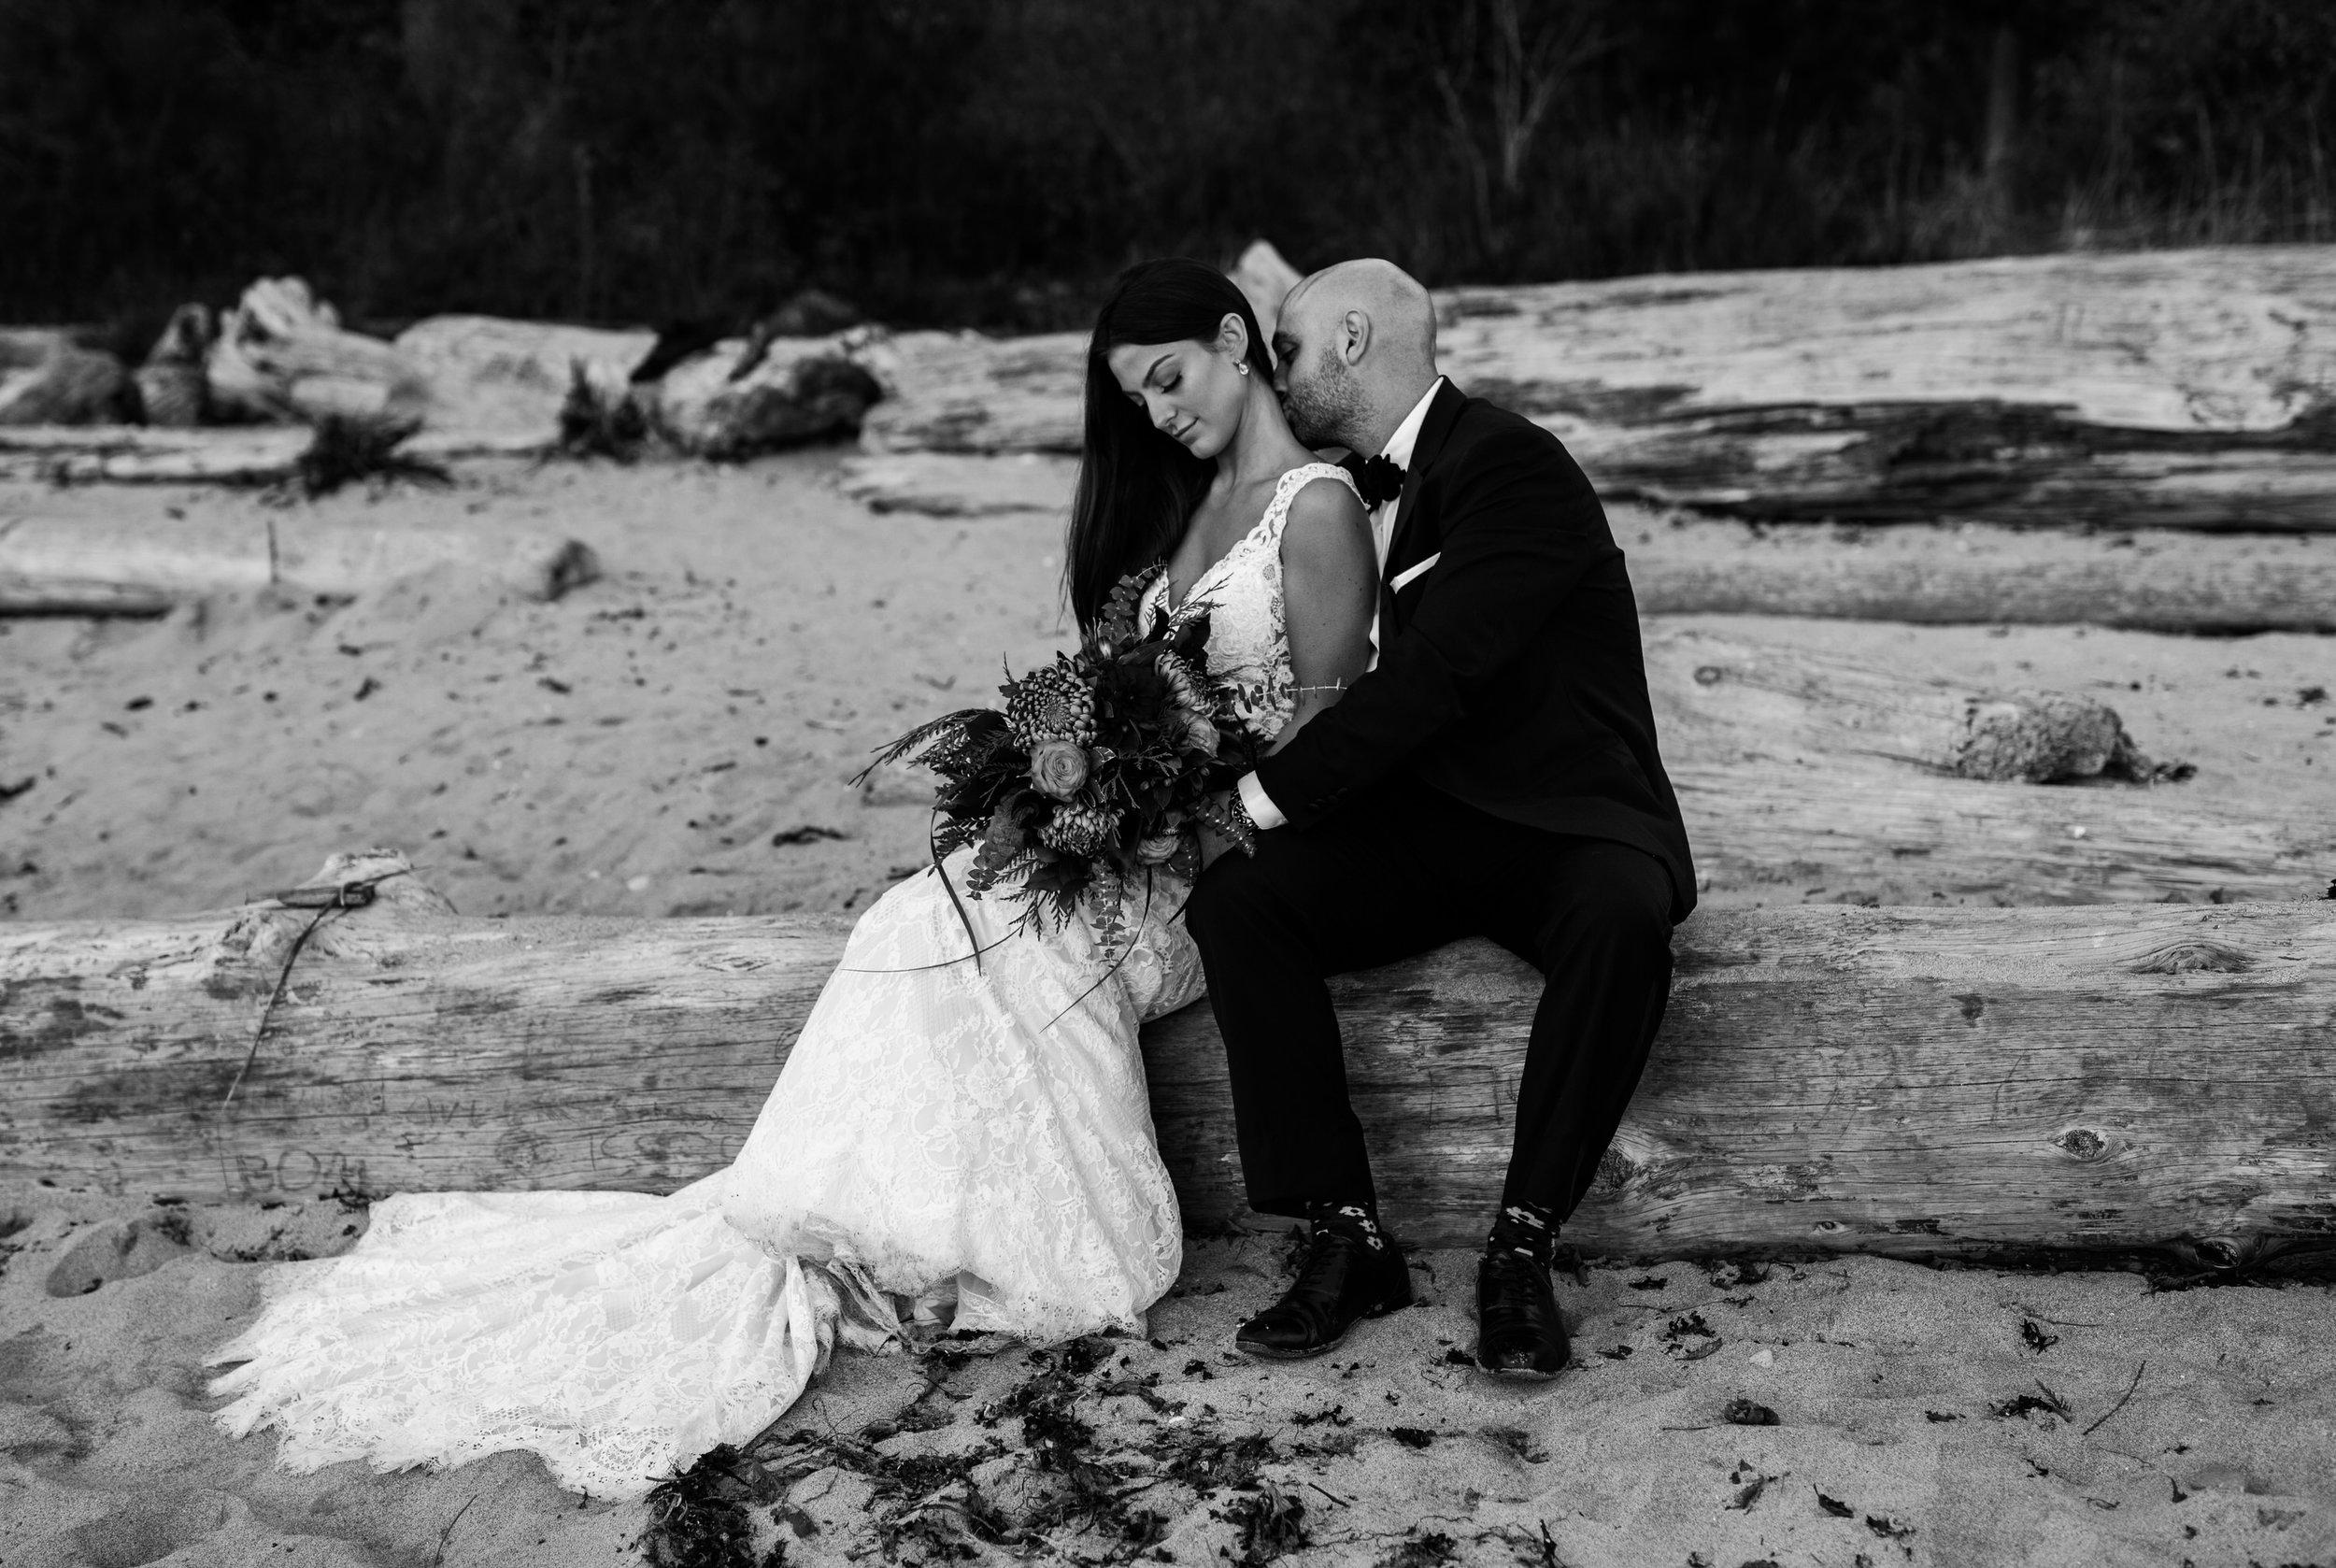 Day After Wedding Photos - Sunshine Coast Wedding Photos - Sunset Wedding Photos - Vancouver Wedding Photographer & Videographer - Sunshine Coast Wedding Photos - Sunshine Coast Wedding Photographer - Jennifer Picard Photography - 1A5A9671.jpg